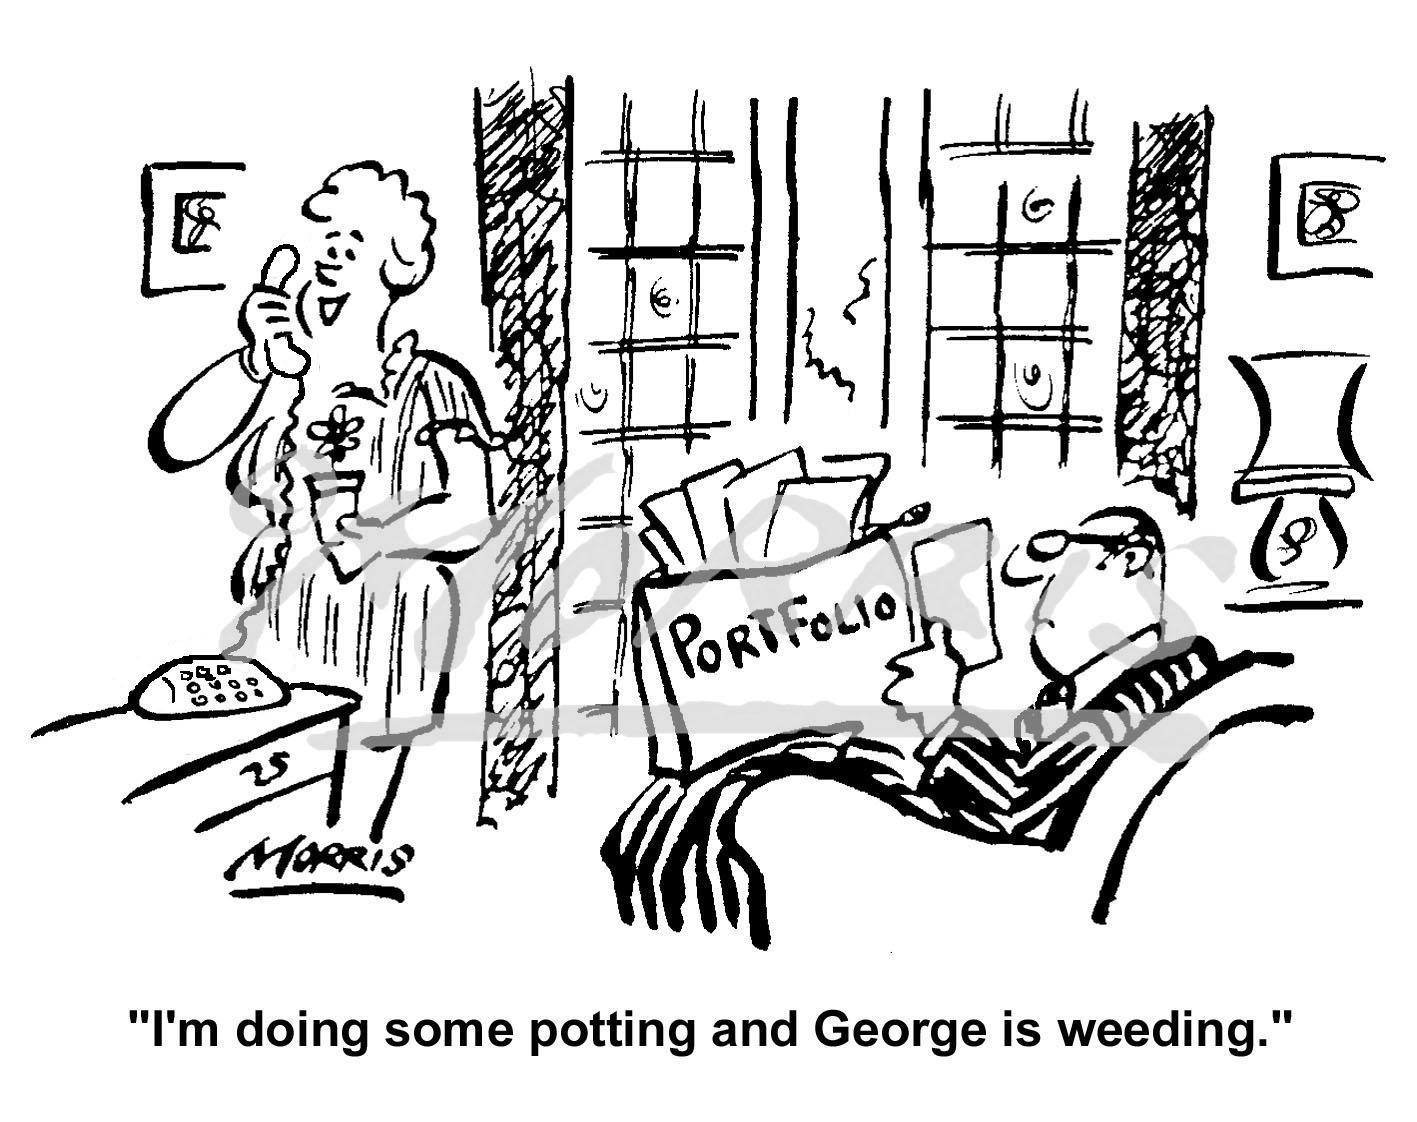 Financial portfolio comic cartoon Ref: 0203bw